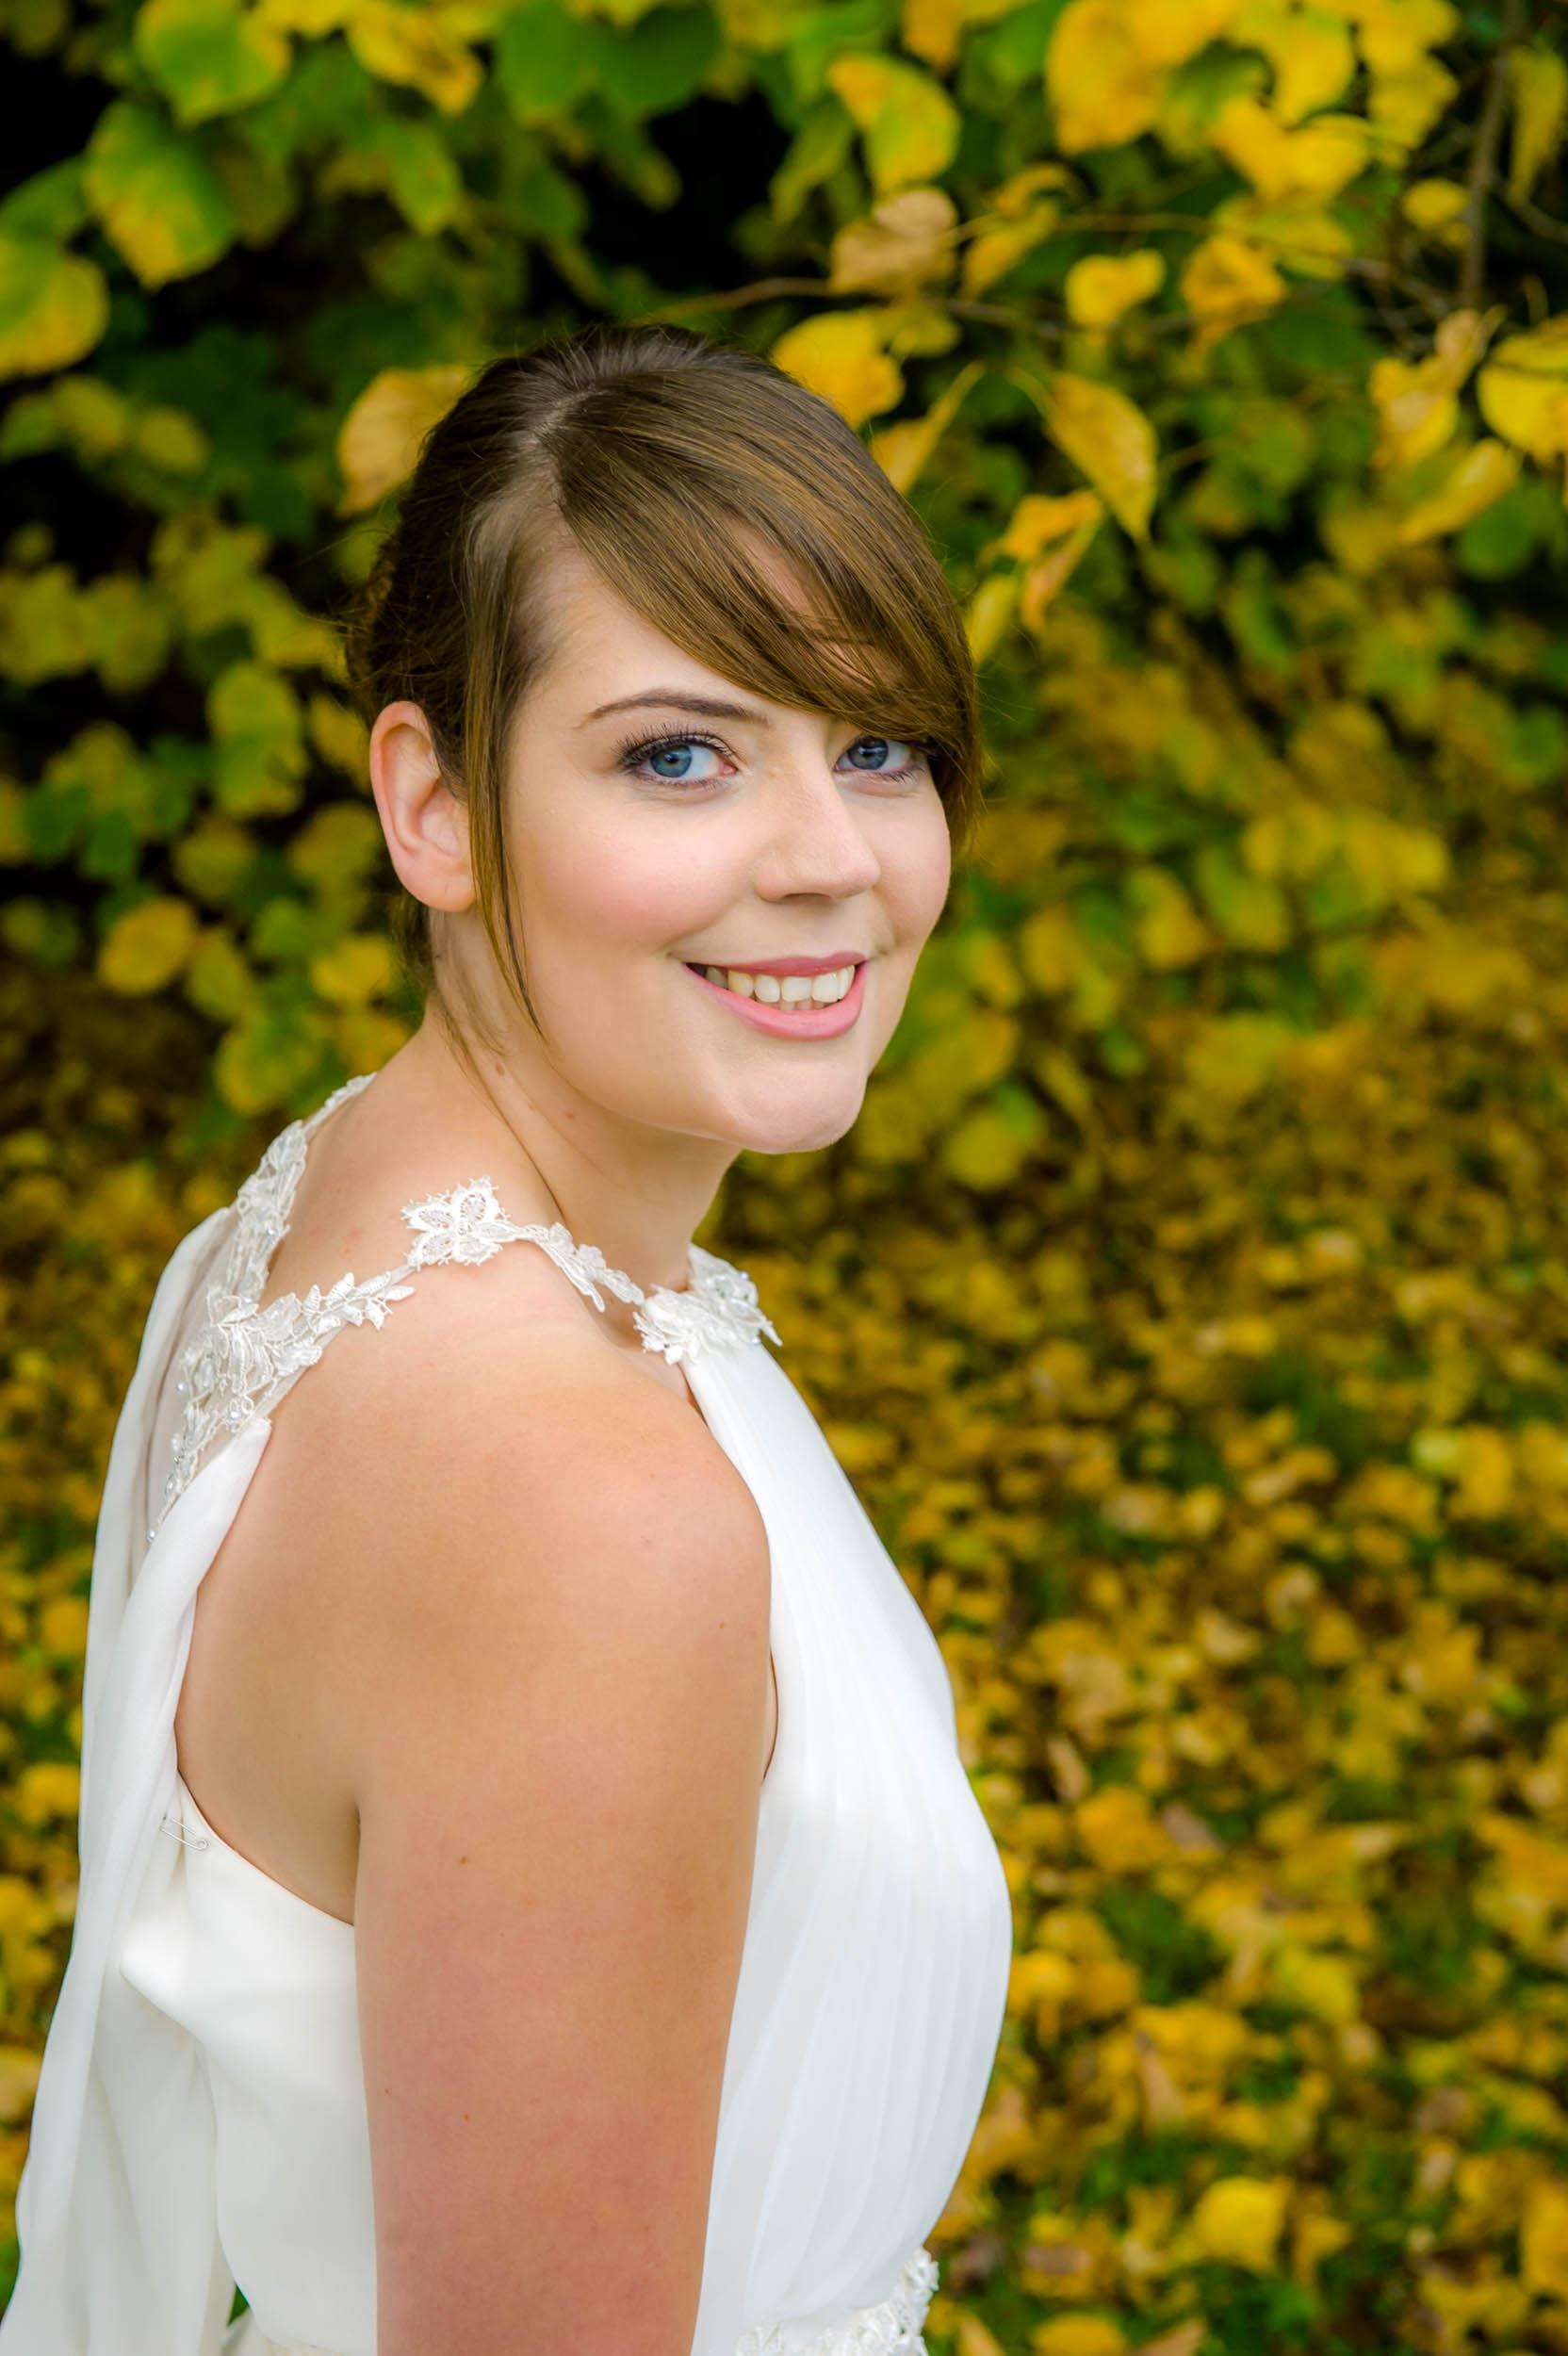 Bride-7575.jpg